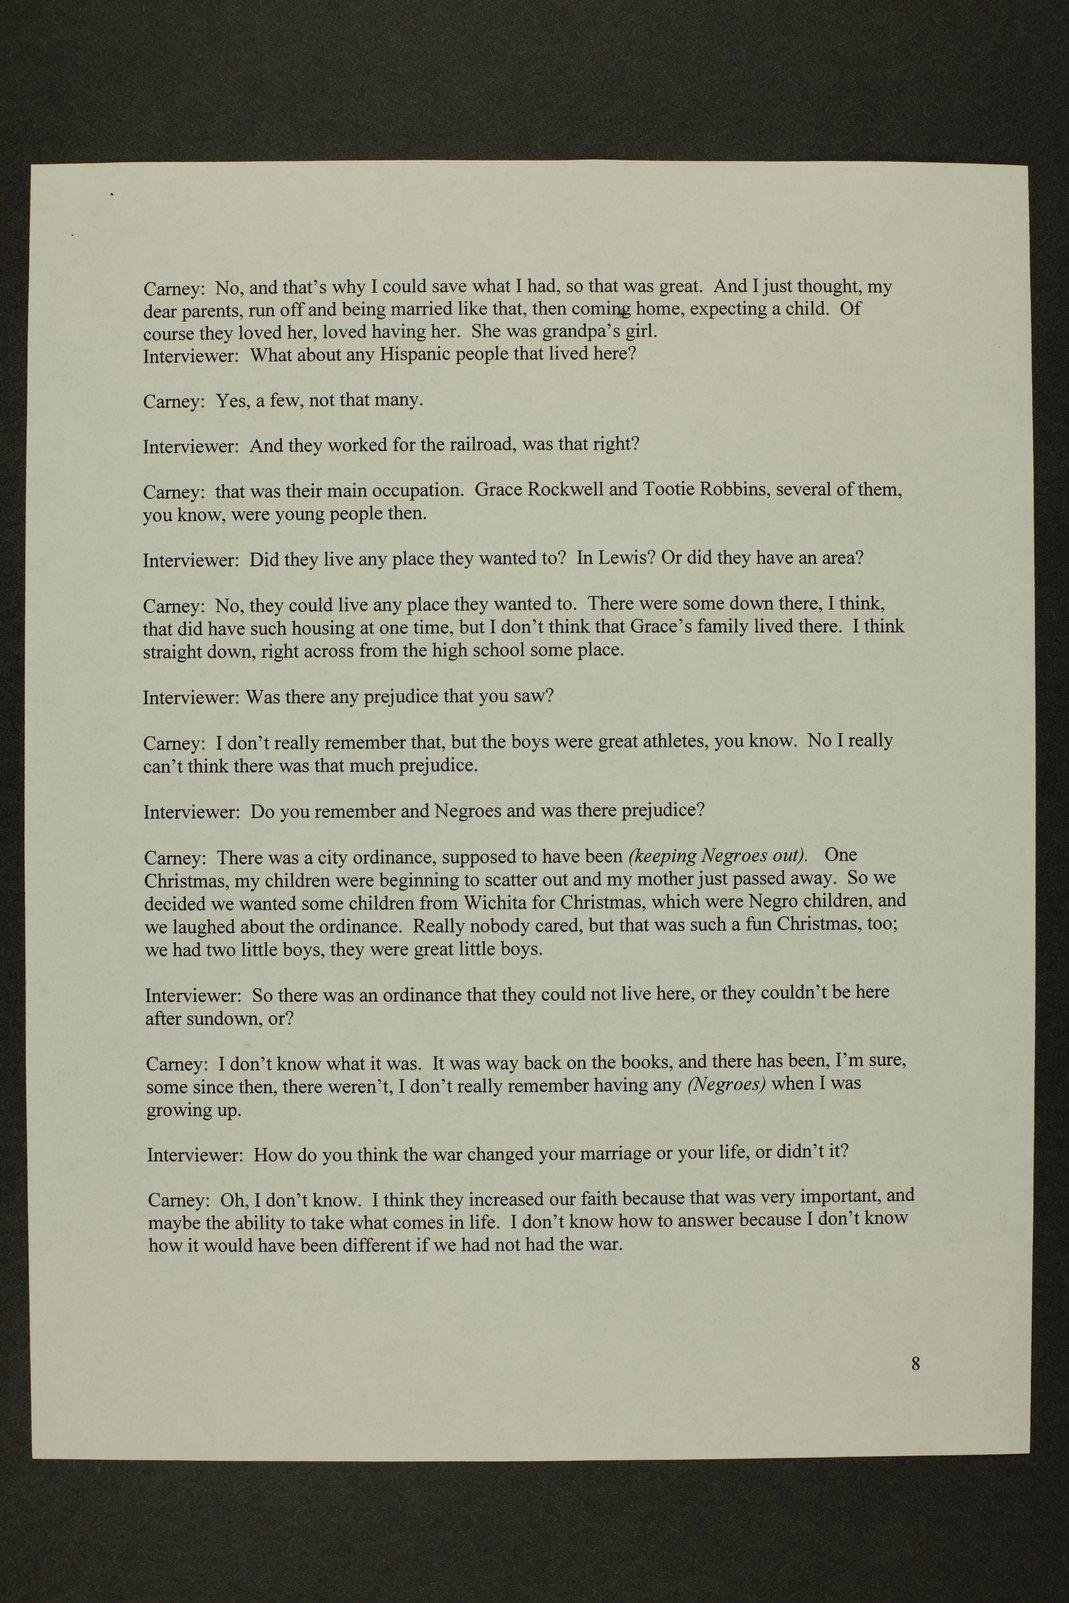 Kathleen Carney interview, WWII oral history, Lewis, Kansas - 8